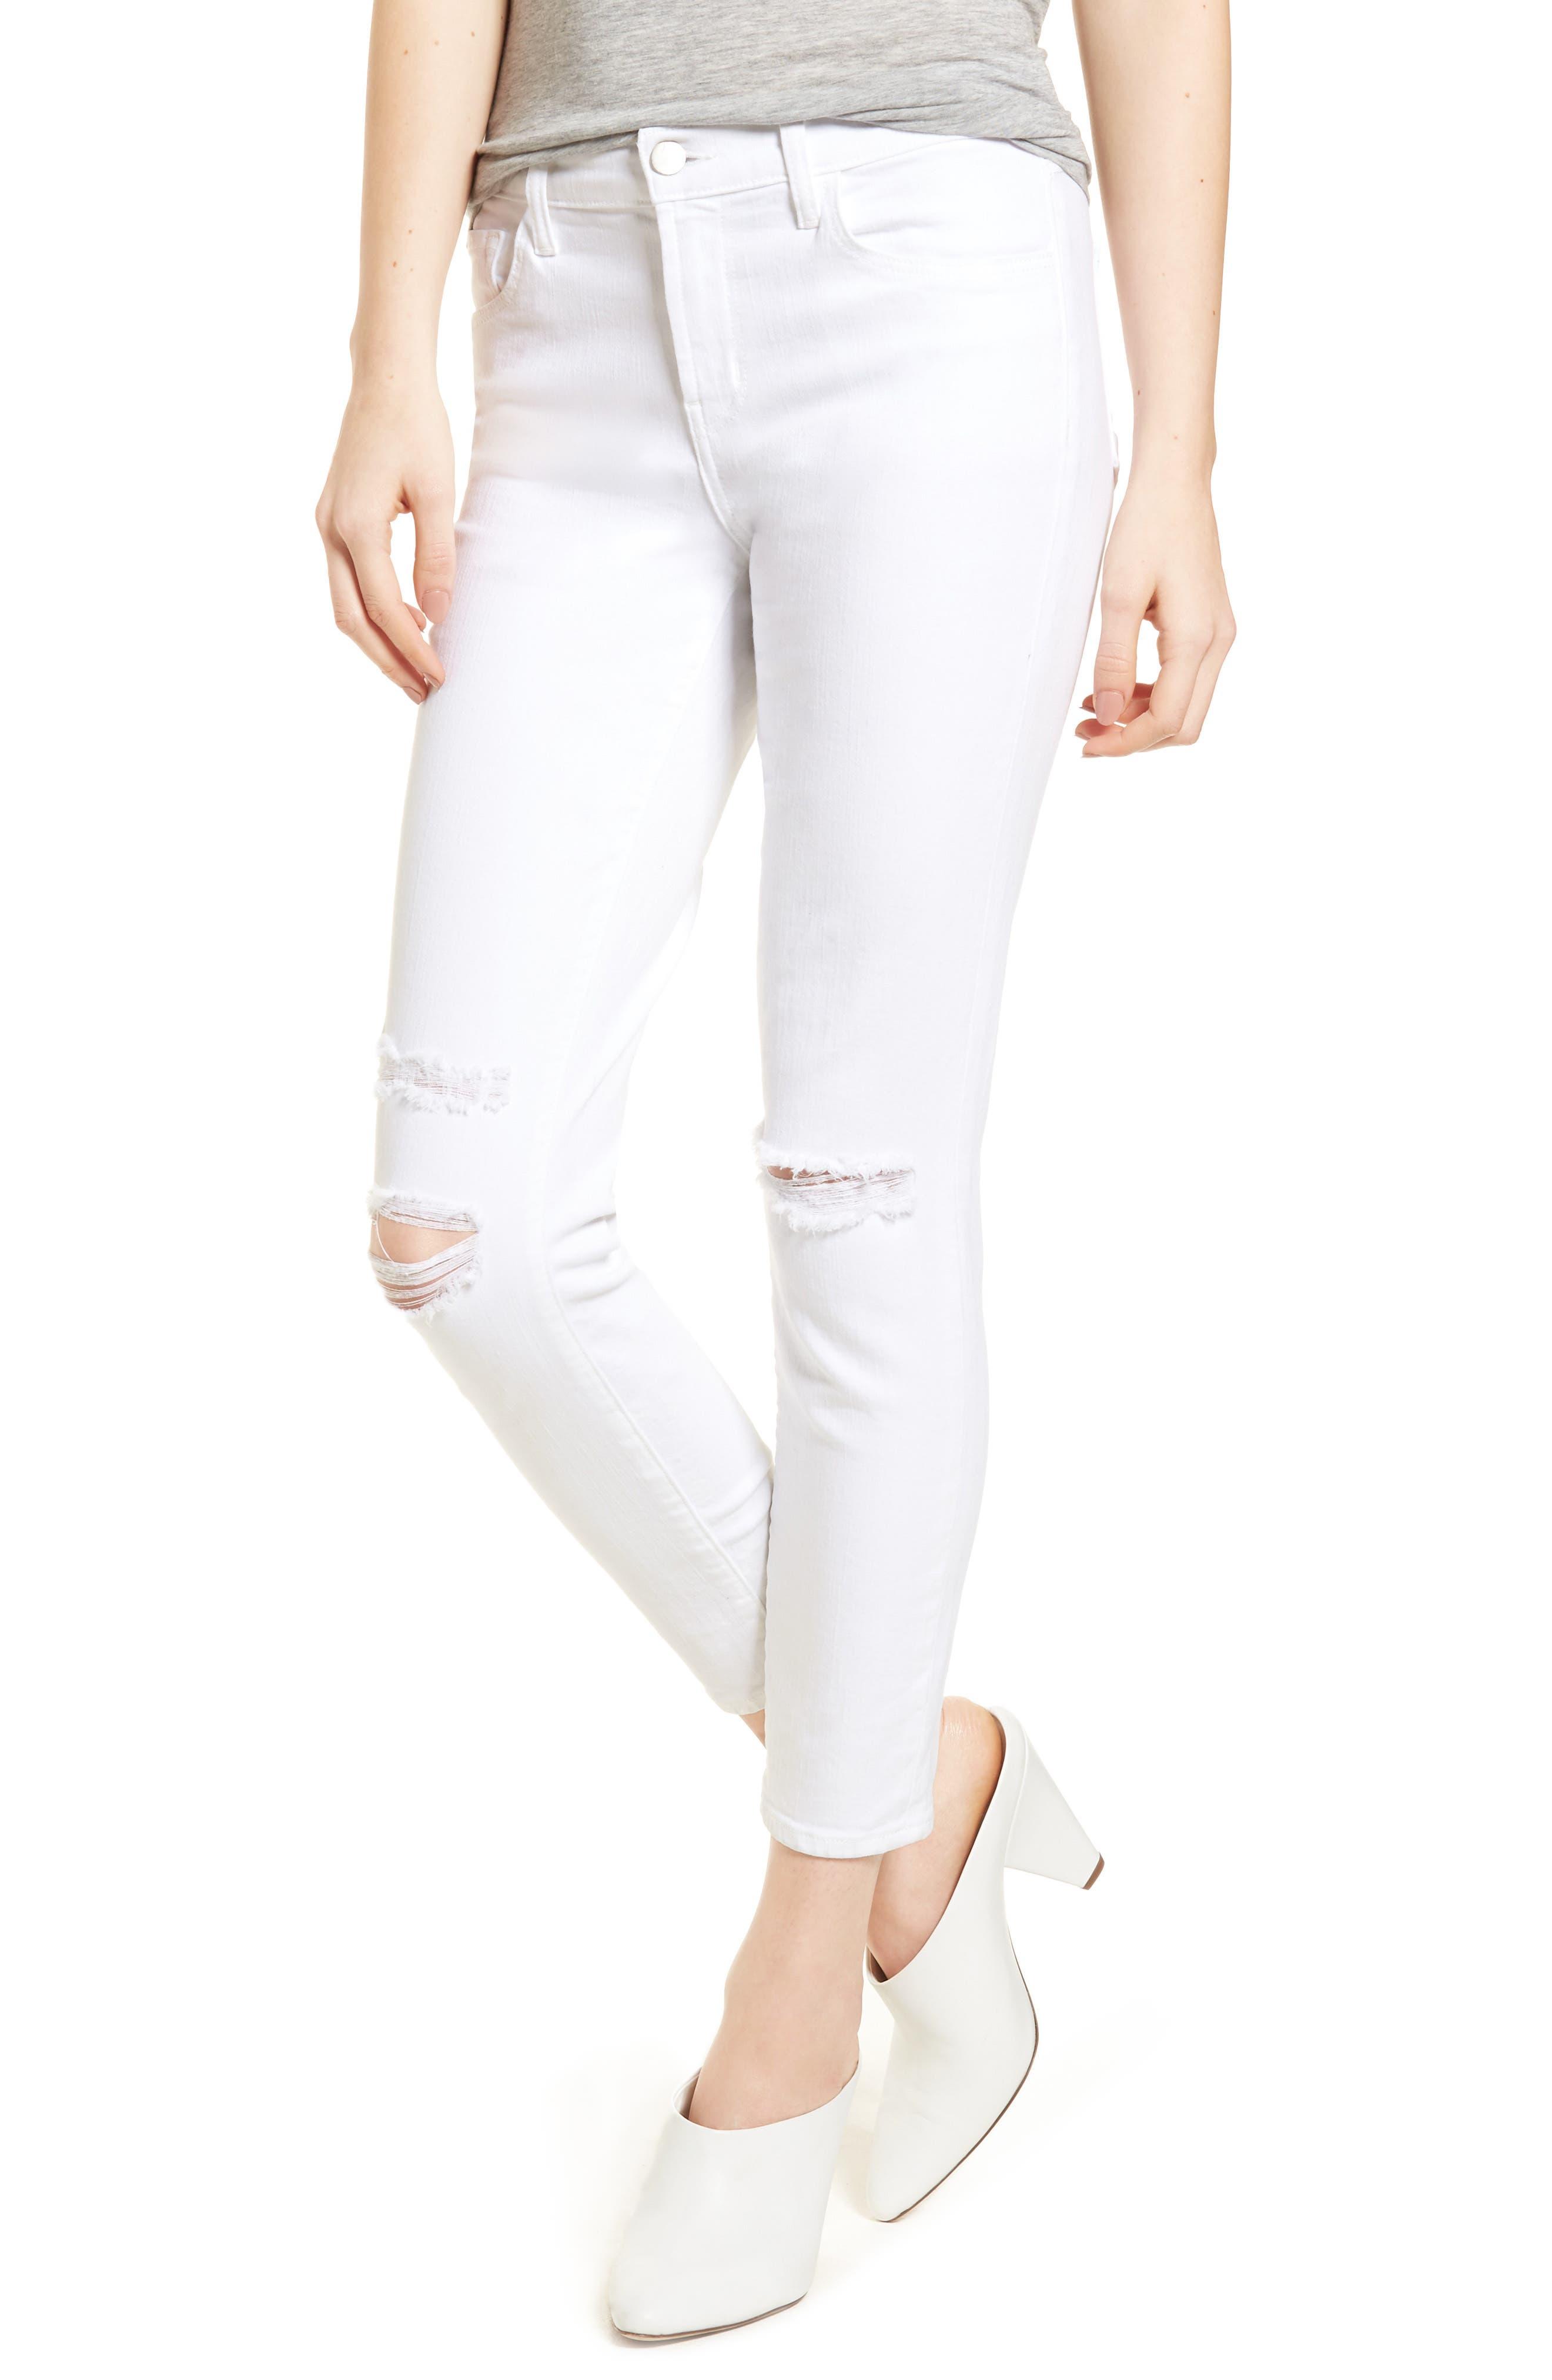 J BRAND Mid-Rise Capri Skinny Jeans, Main, color, 101